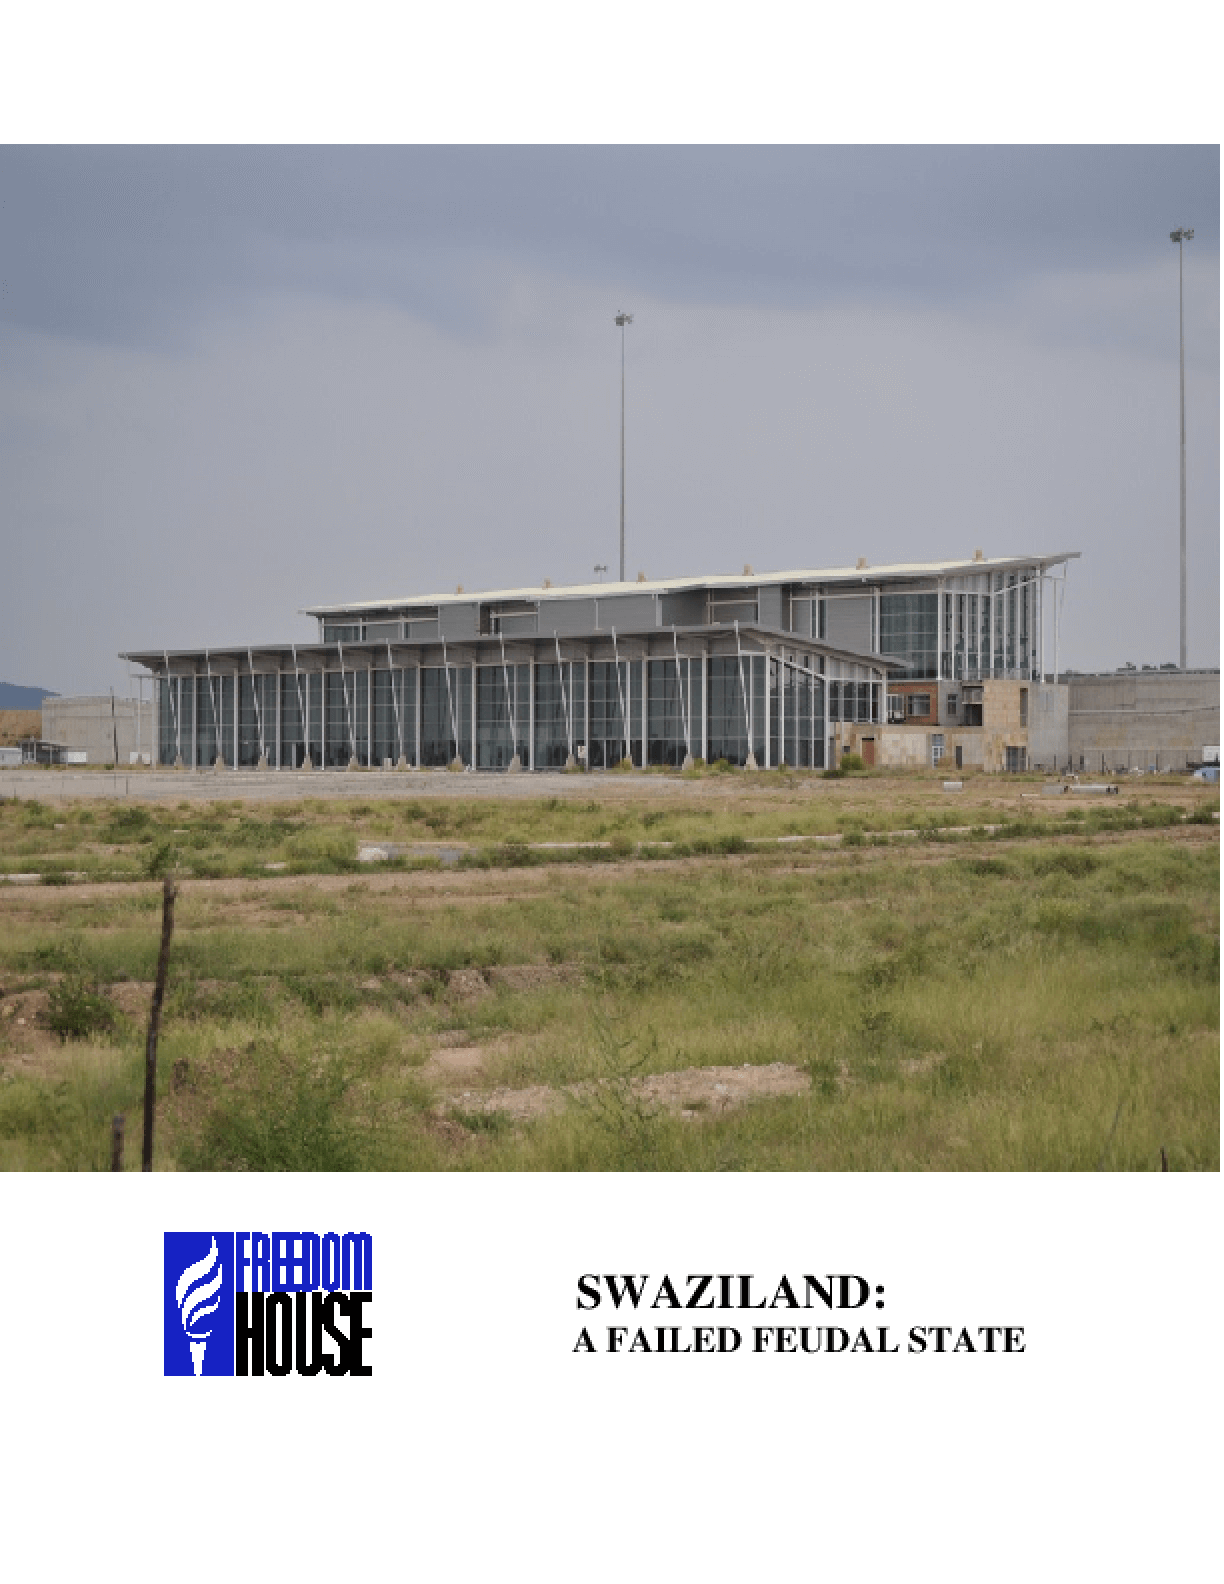 Swaziland: A Failed Feudal State